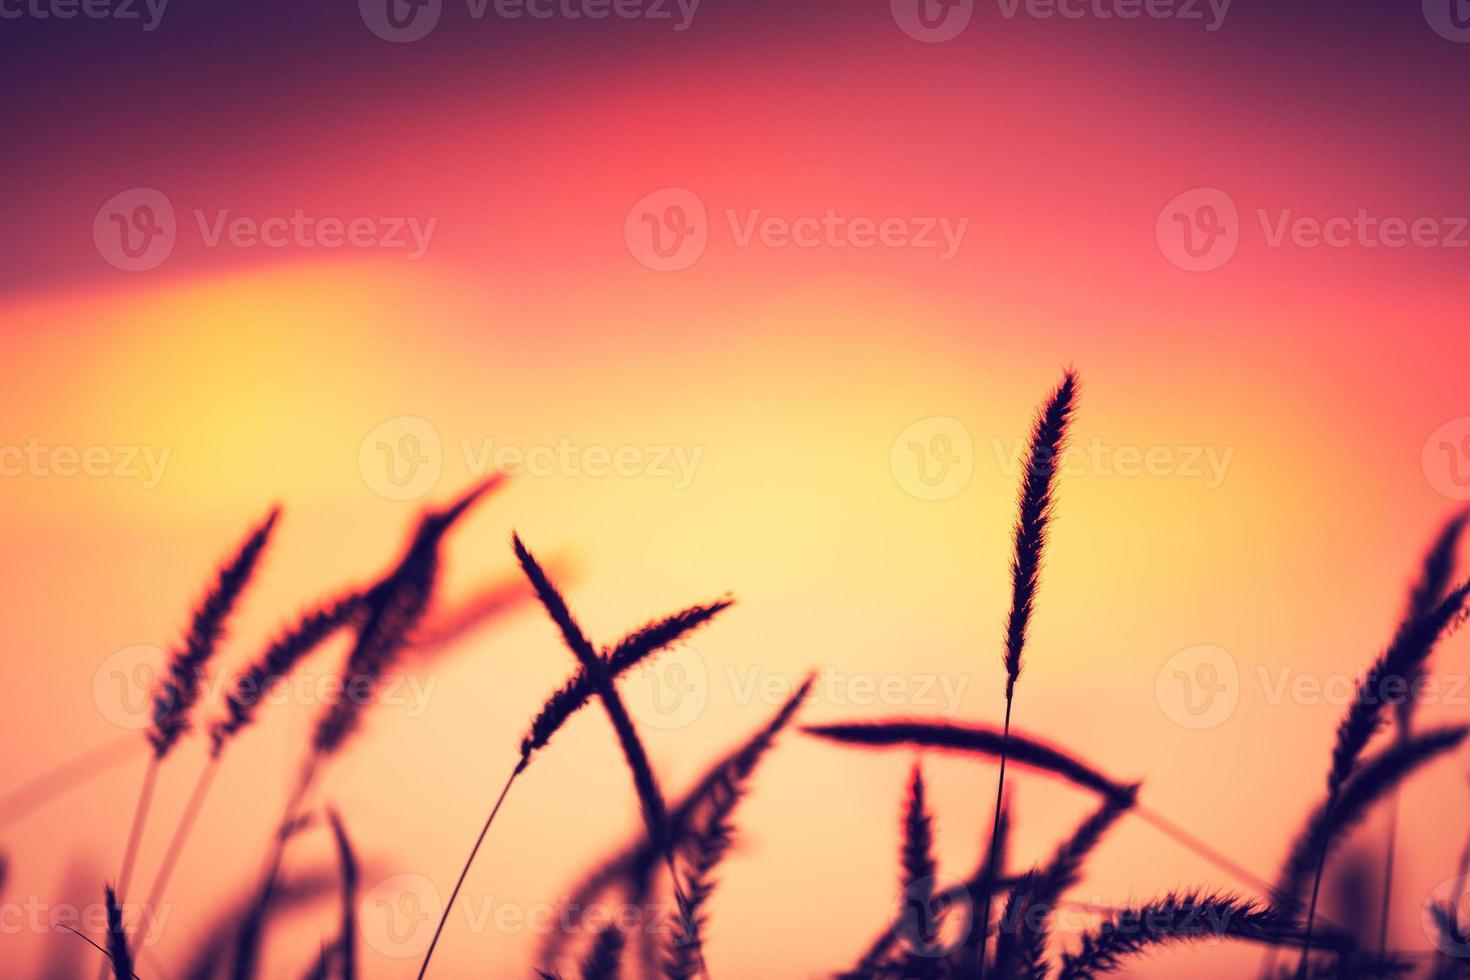 Sunset Field, Beautiful Vibrant Color photo